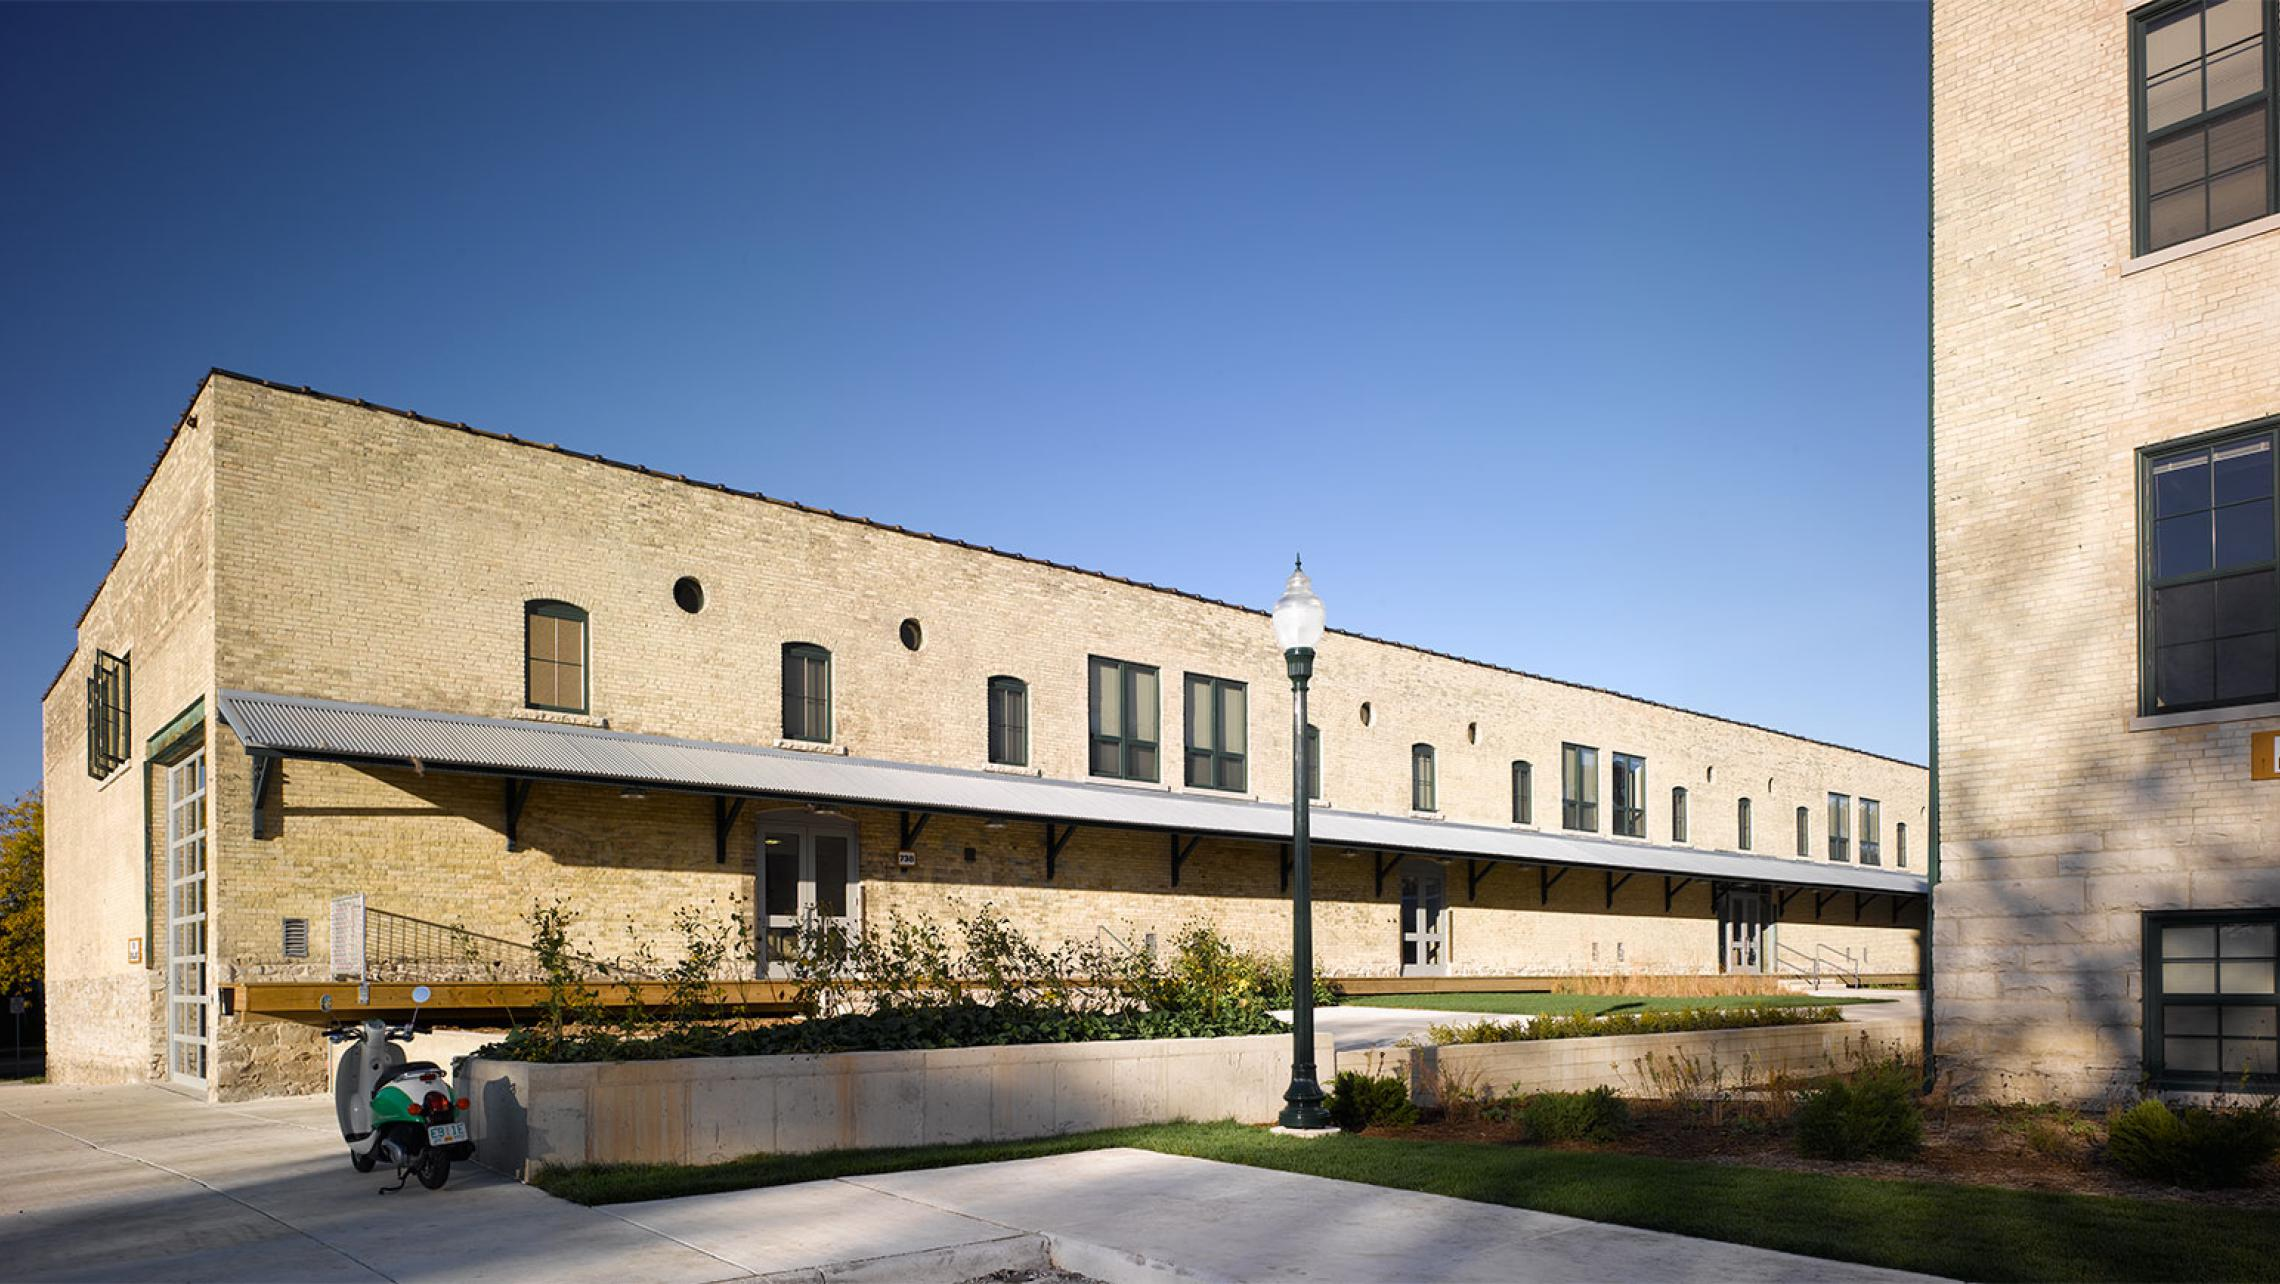 ULI Tobacco Lofts Apartments - Exterior View Adaptive Reuse